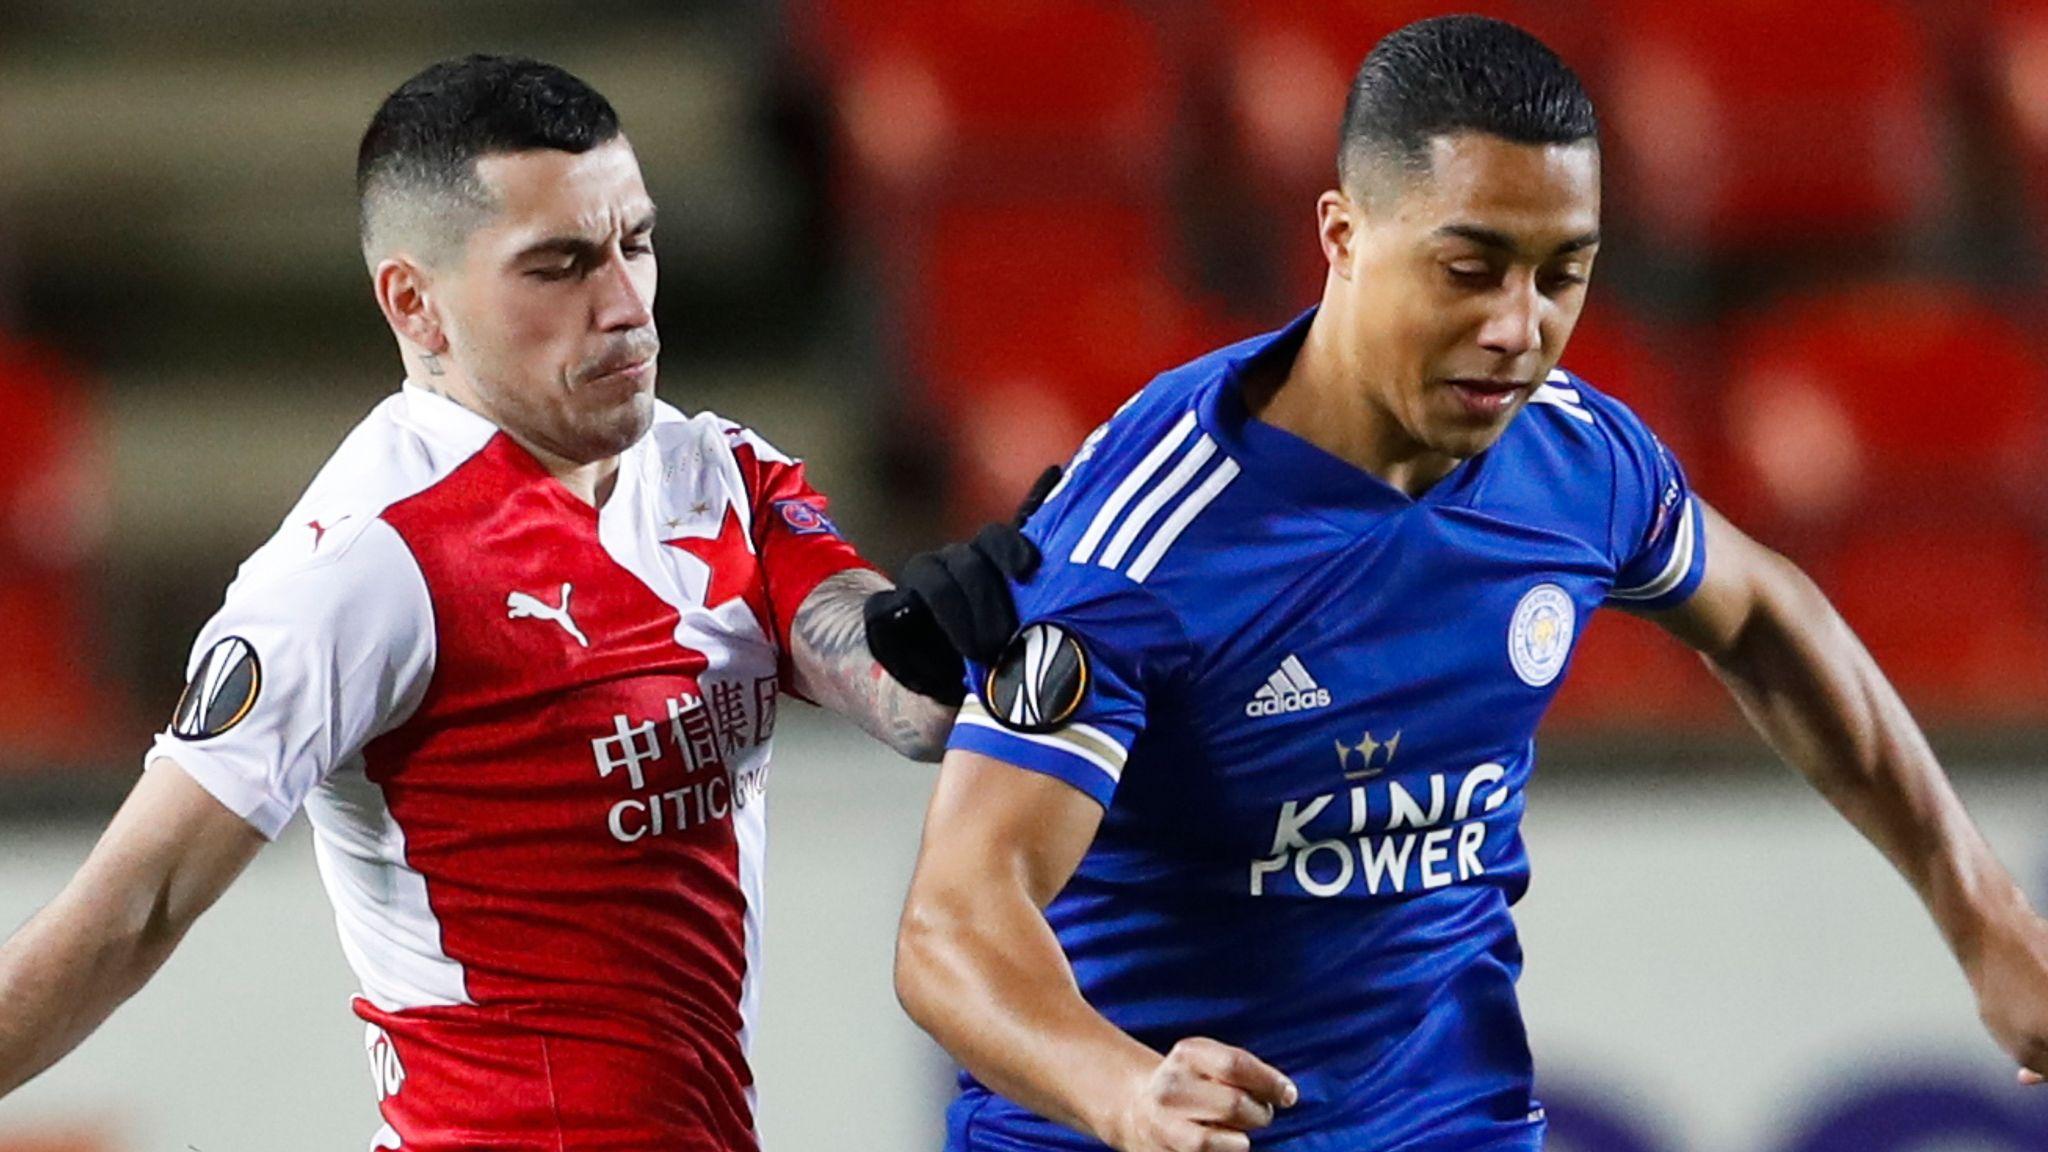 Slavia Prague vs Rangers: Prediction, Lineups, Team News, Betting Tips & Match Previews